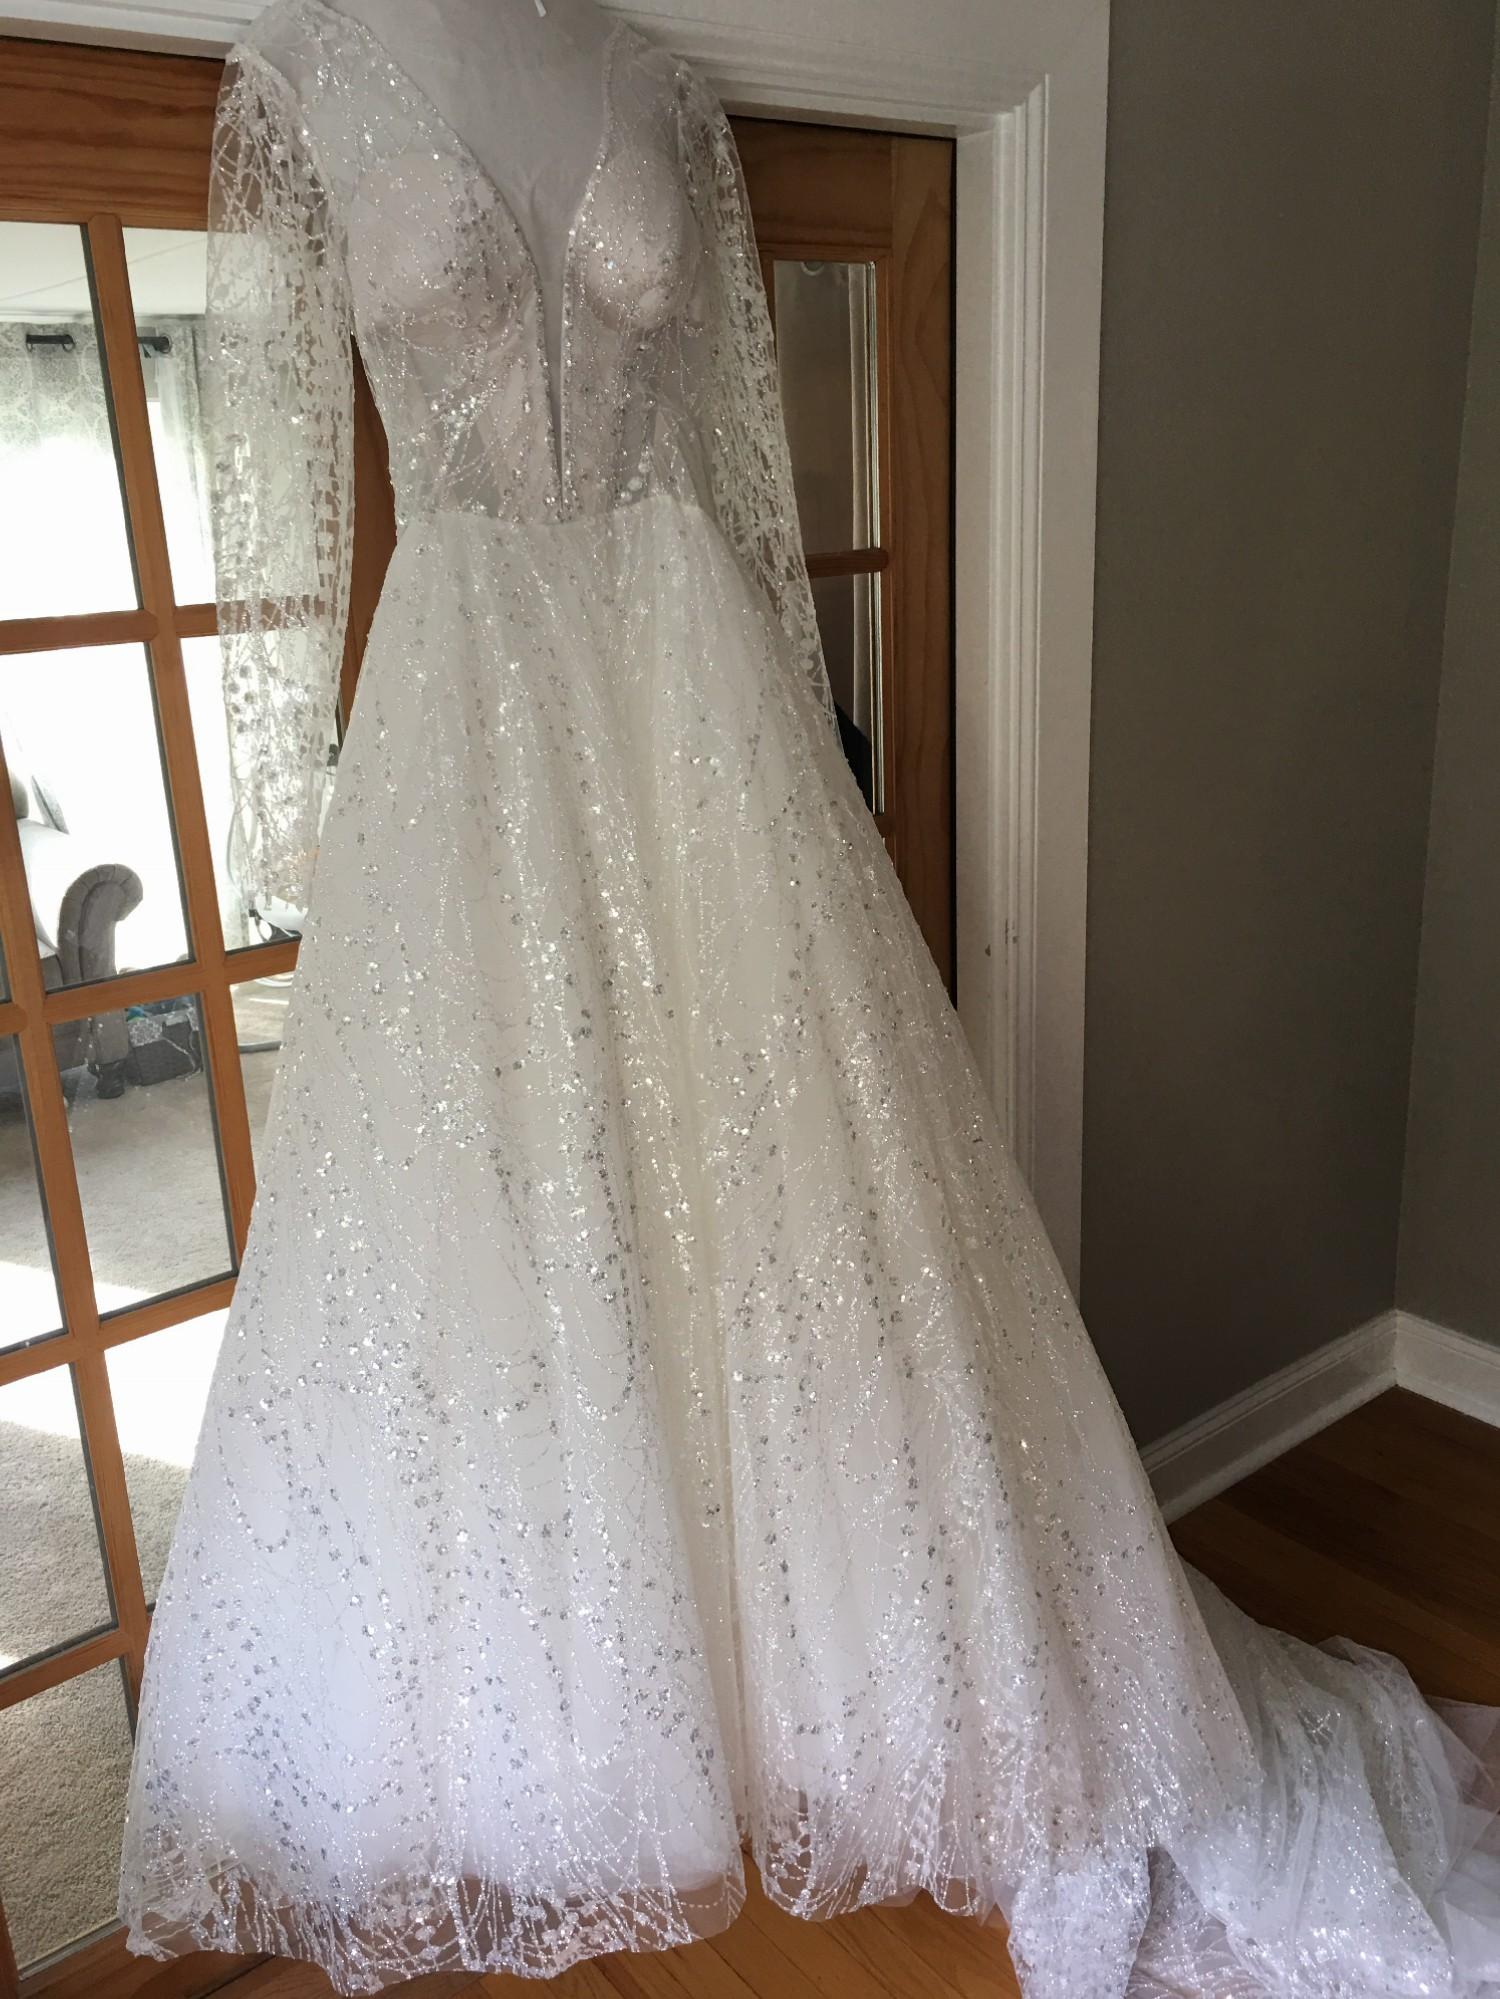 6c6d55a7f482 Pnina Tornai Ball Gown New Wedding Dress on Sale 64% Off ...